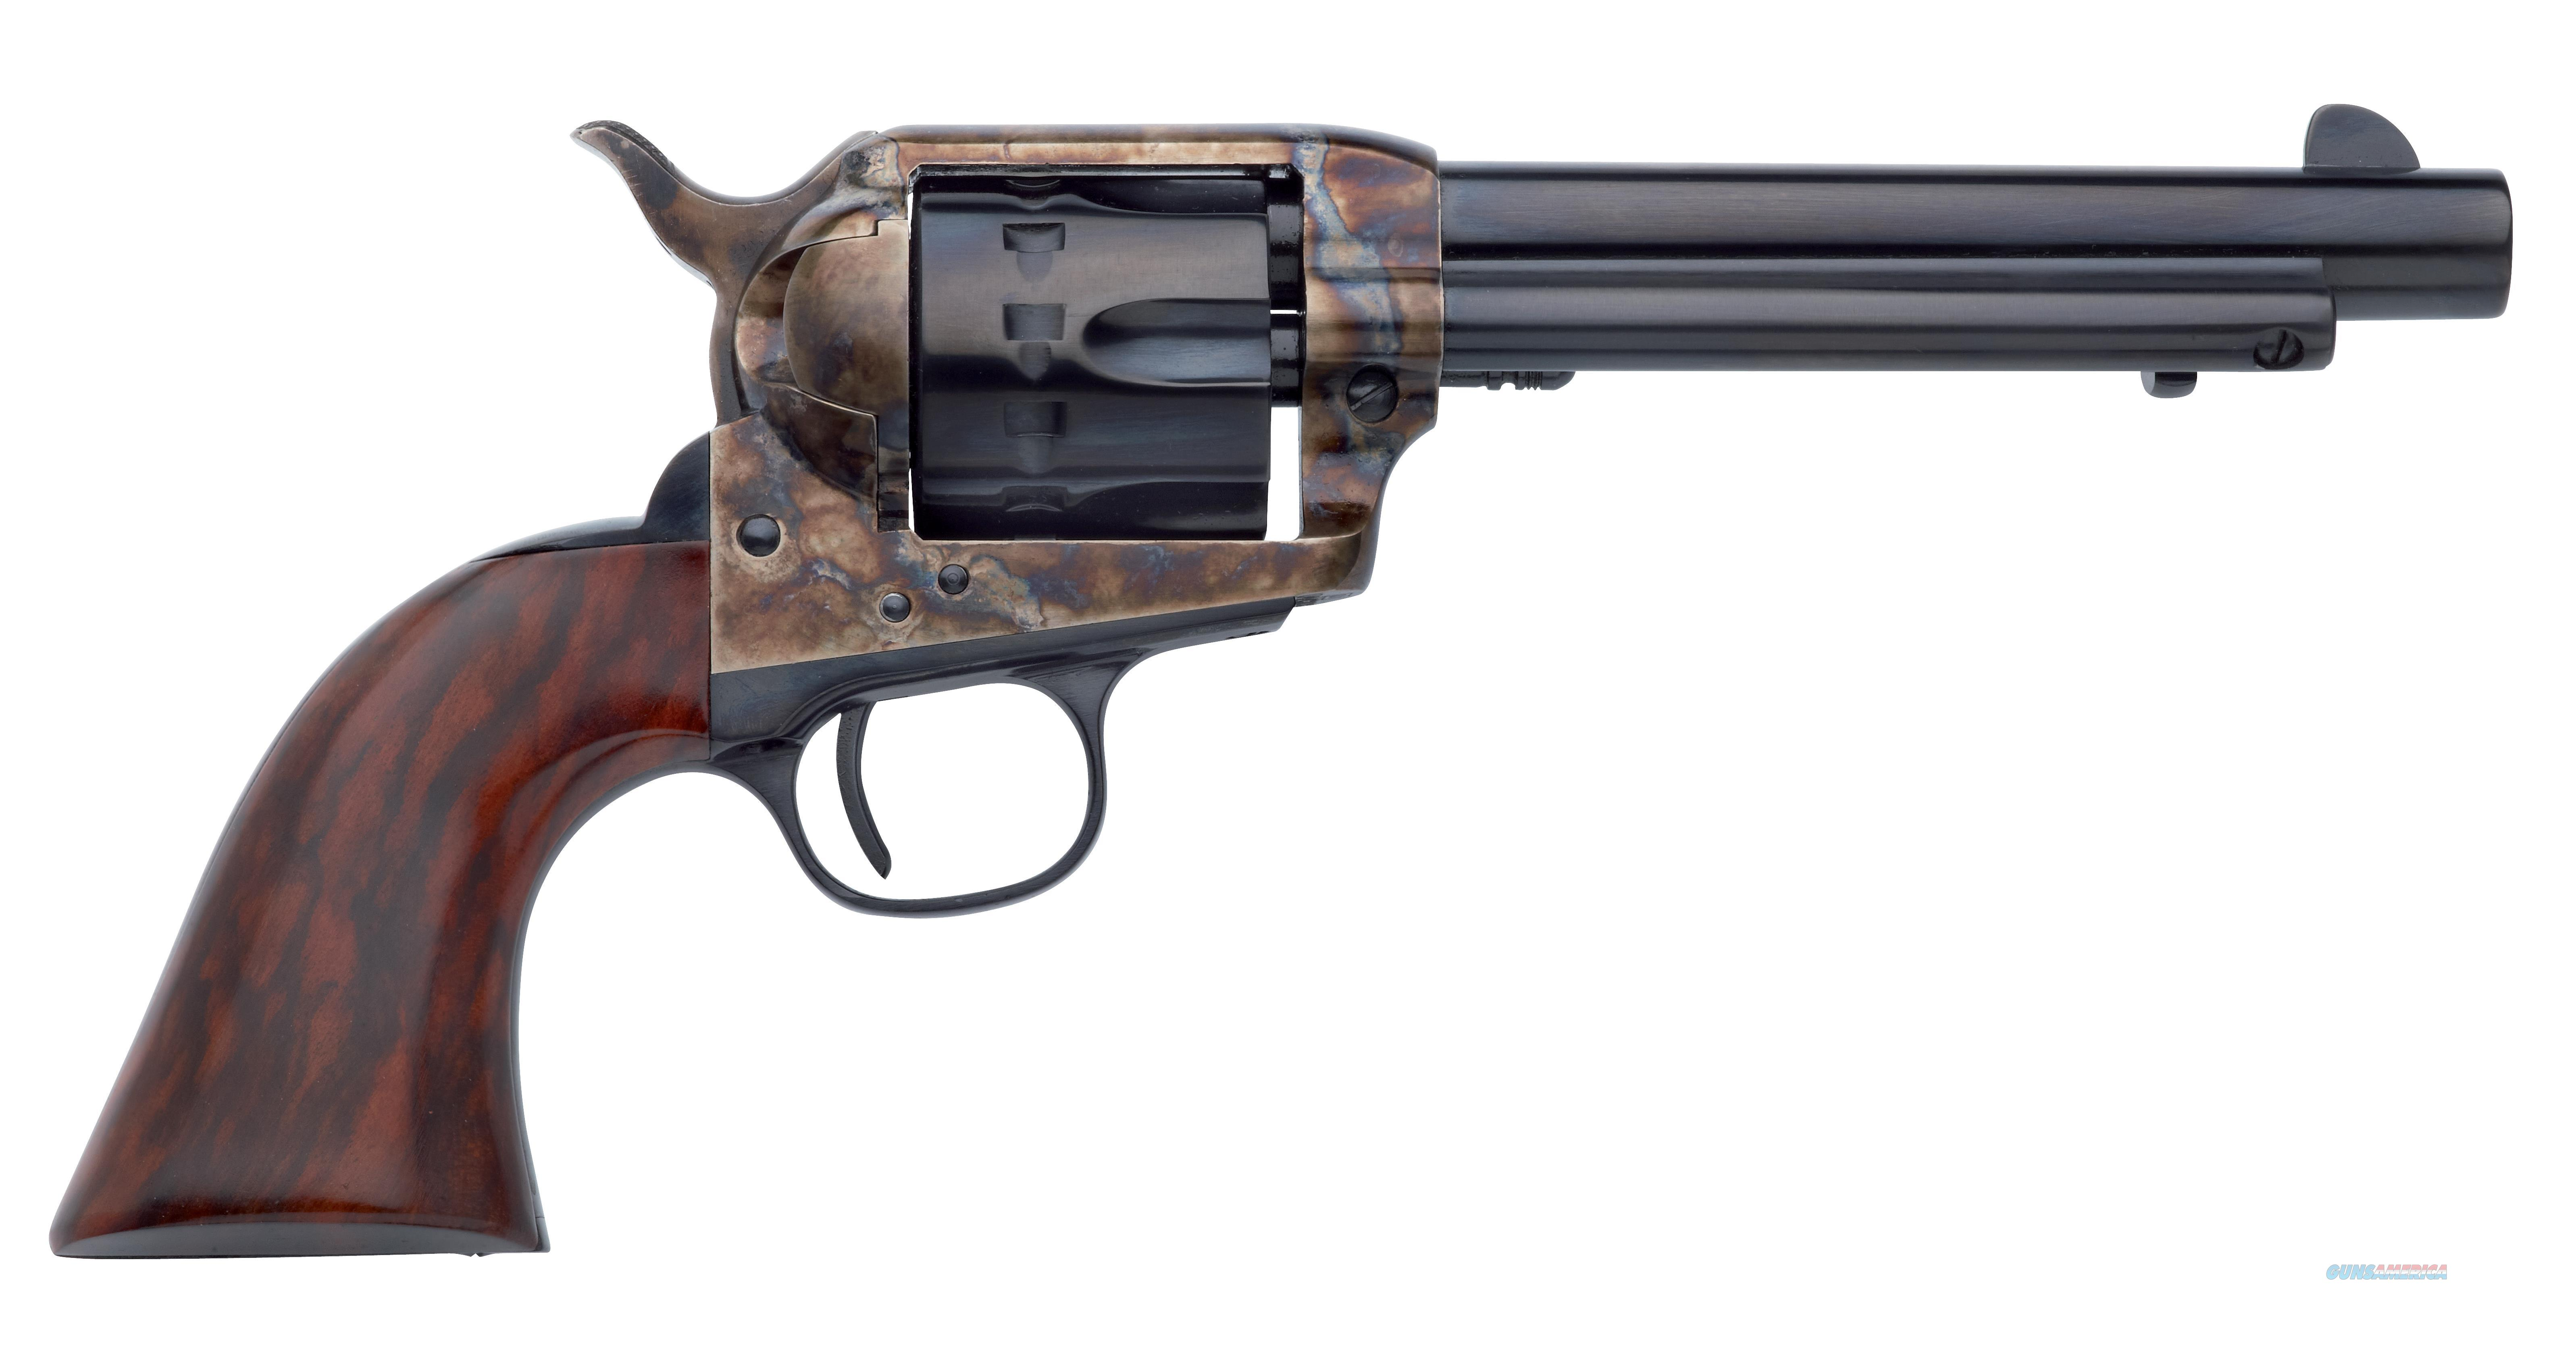 "Taylors And Company 4052 1873 Cattleman Single Action Revolver 22 Long Rifle (Lr) 5.5"" 12 Rd Walnut Grip Color Case Hardened Frame/Blued Barrel 4052  Guns > Pistols > TU Misc Pistols"